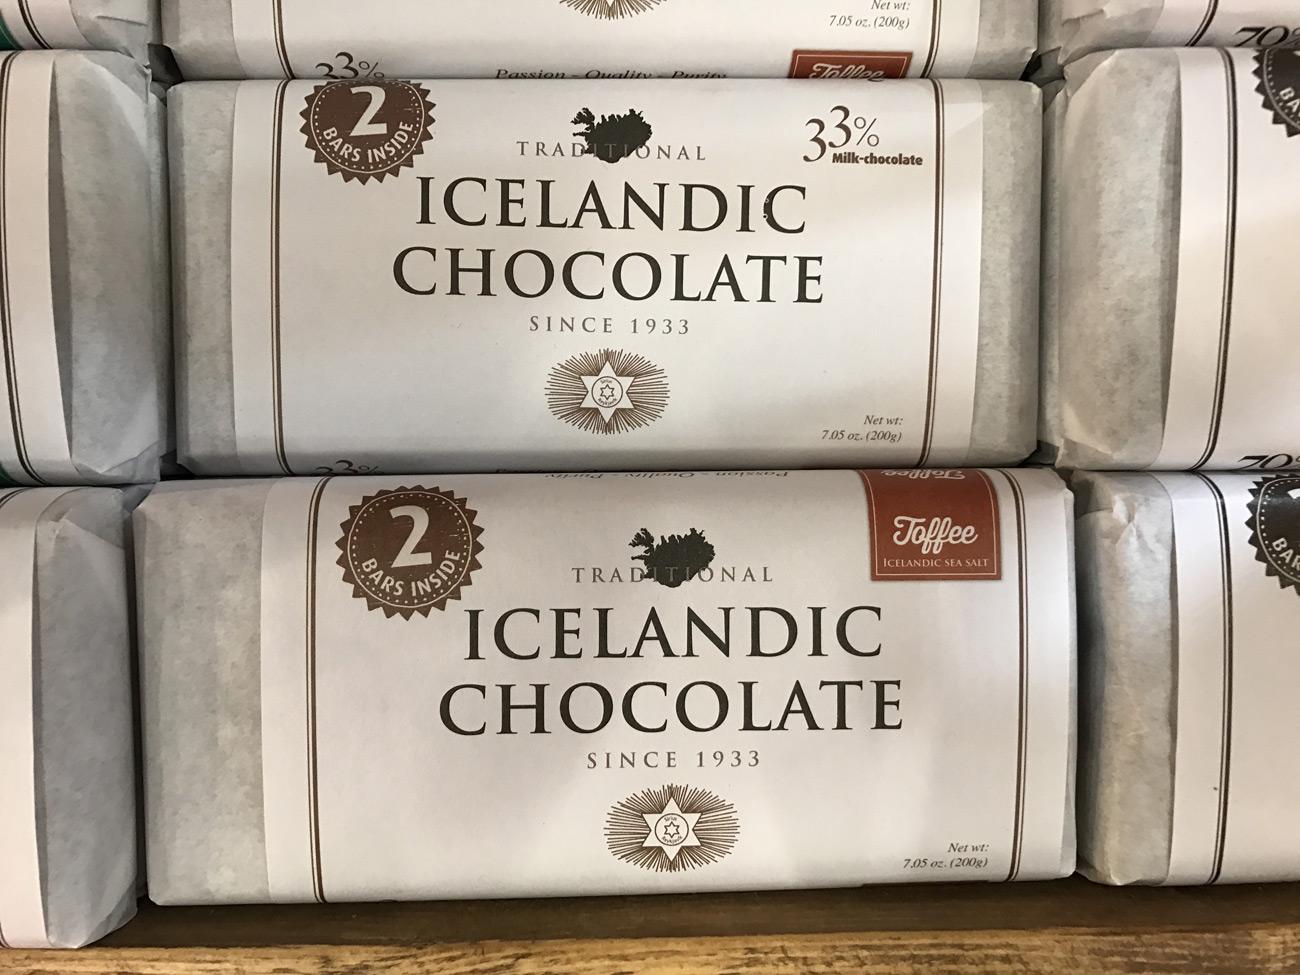 Traditional Icelandic Chocolate